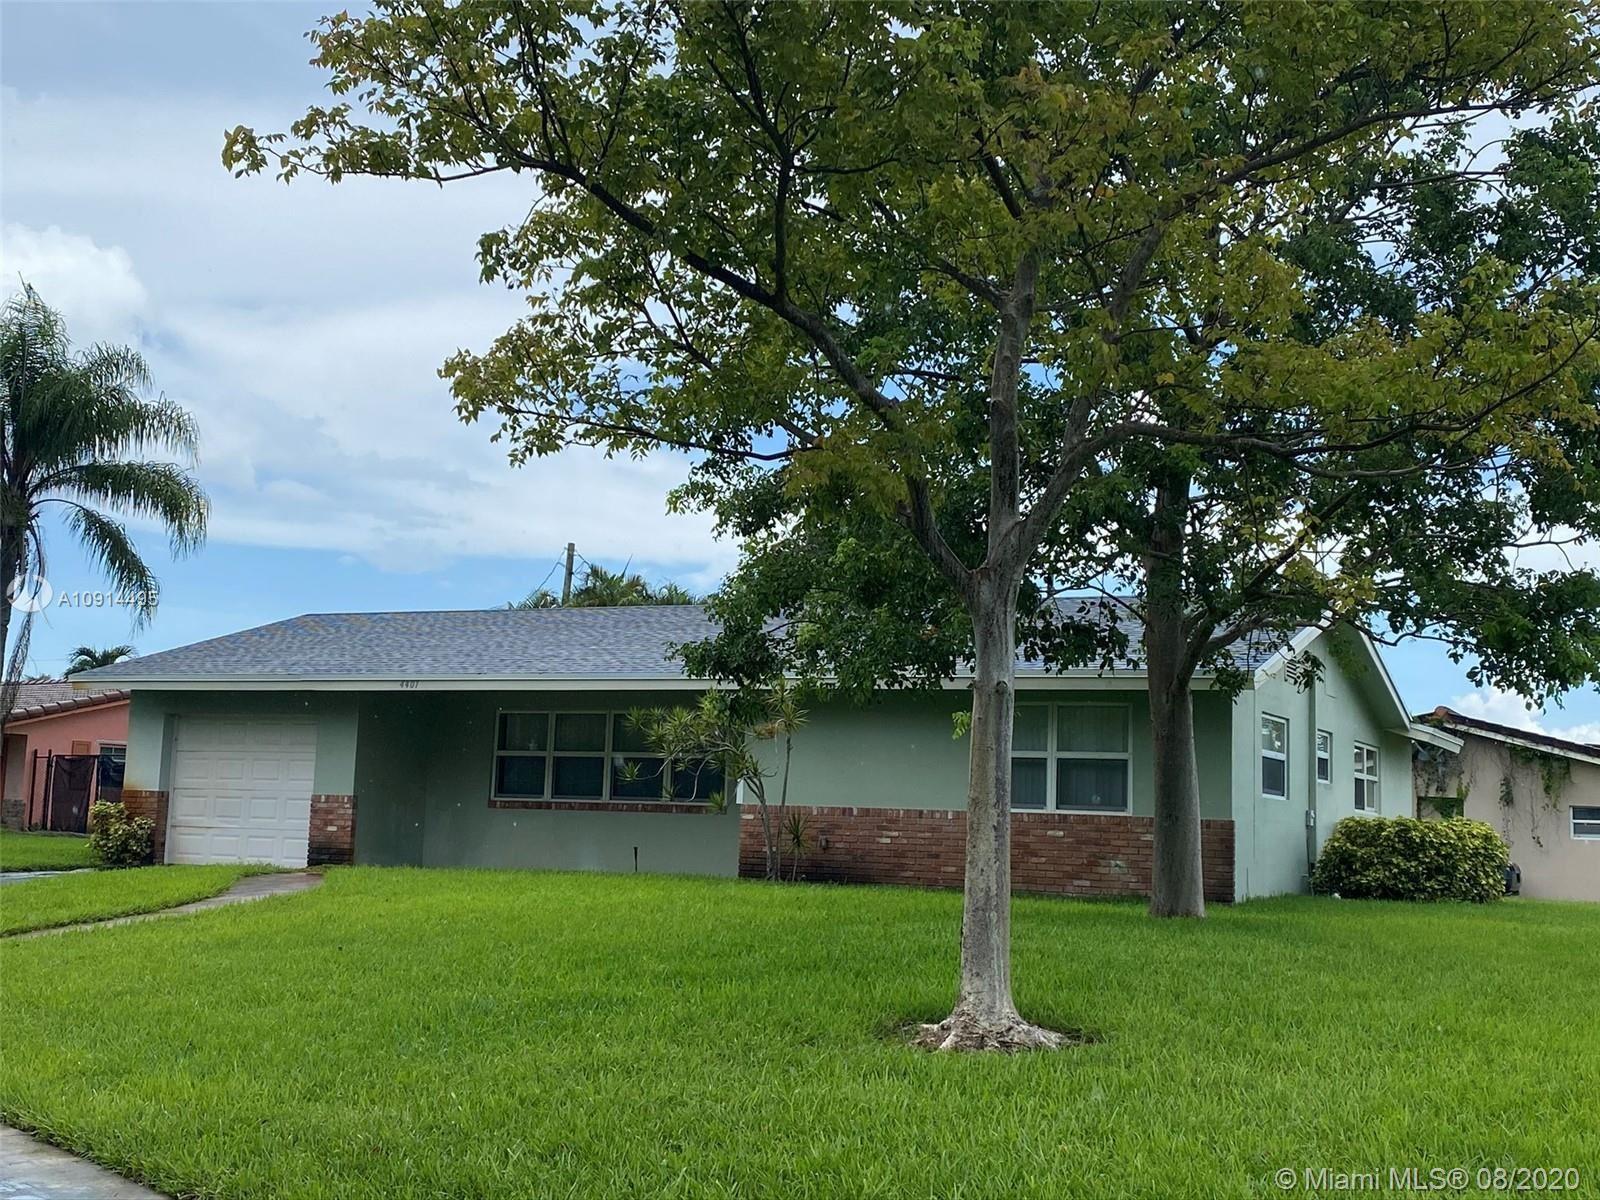 4401 NW 7th St, Coconut Creek, FL 33066 - #: A10914495